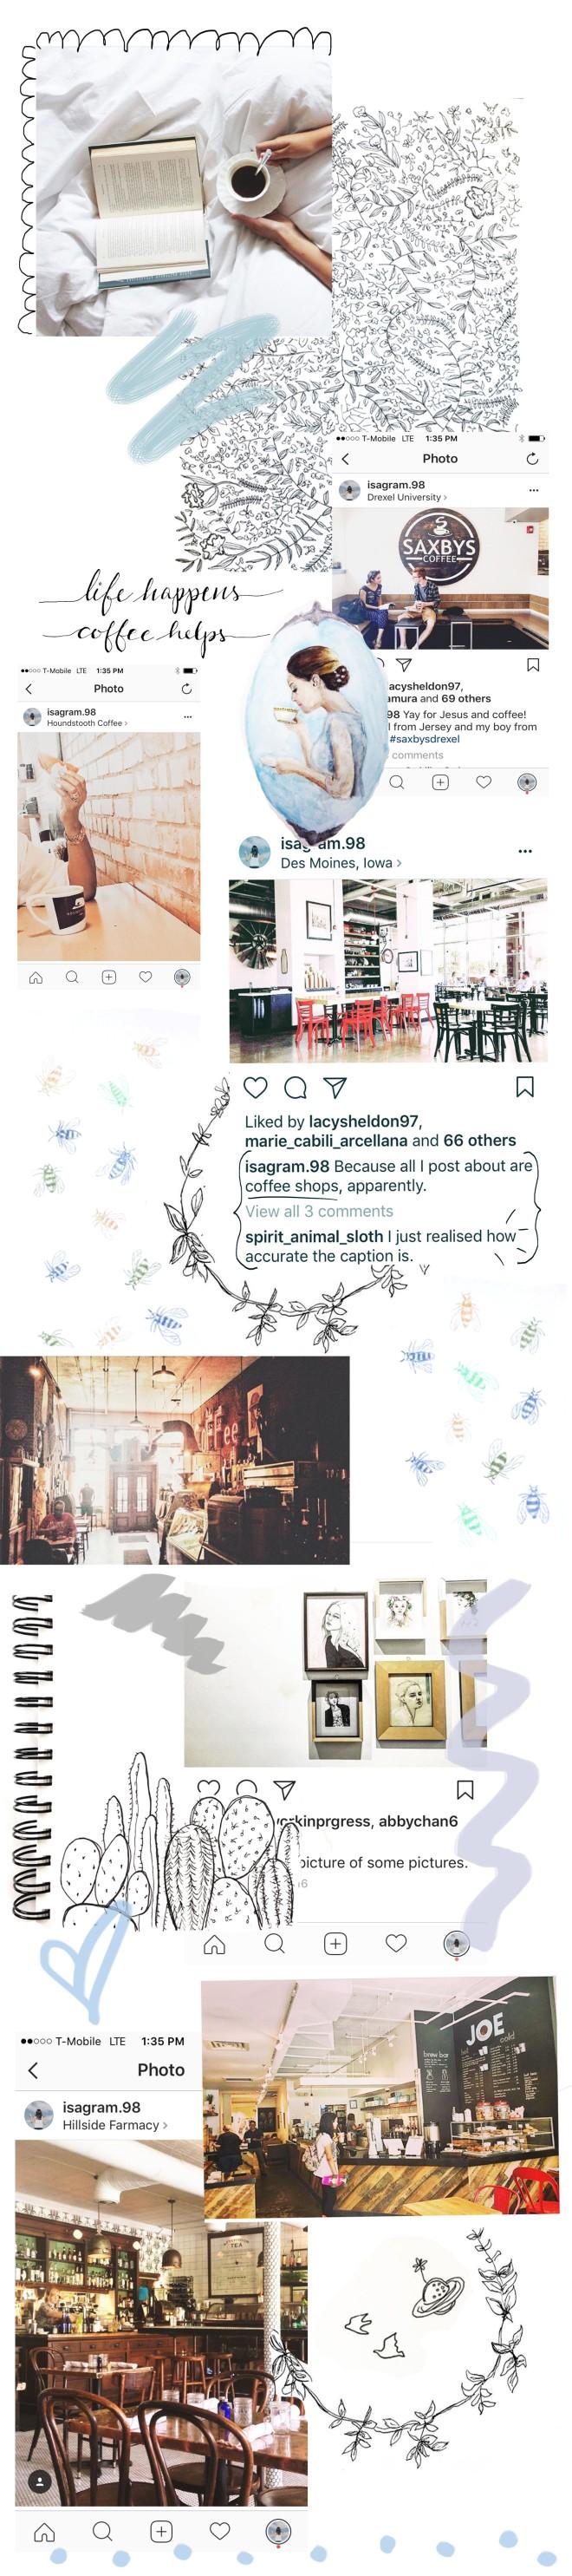 Coffe InstaStory